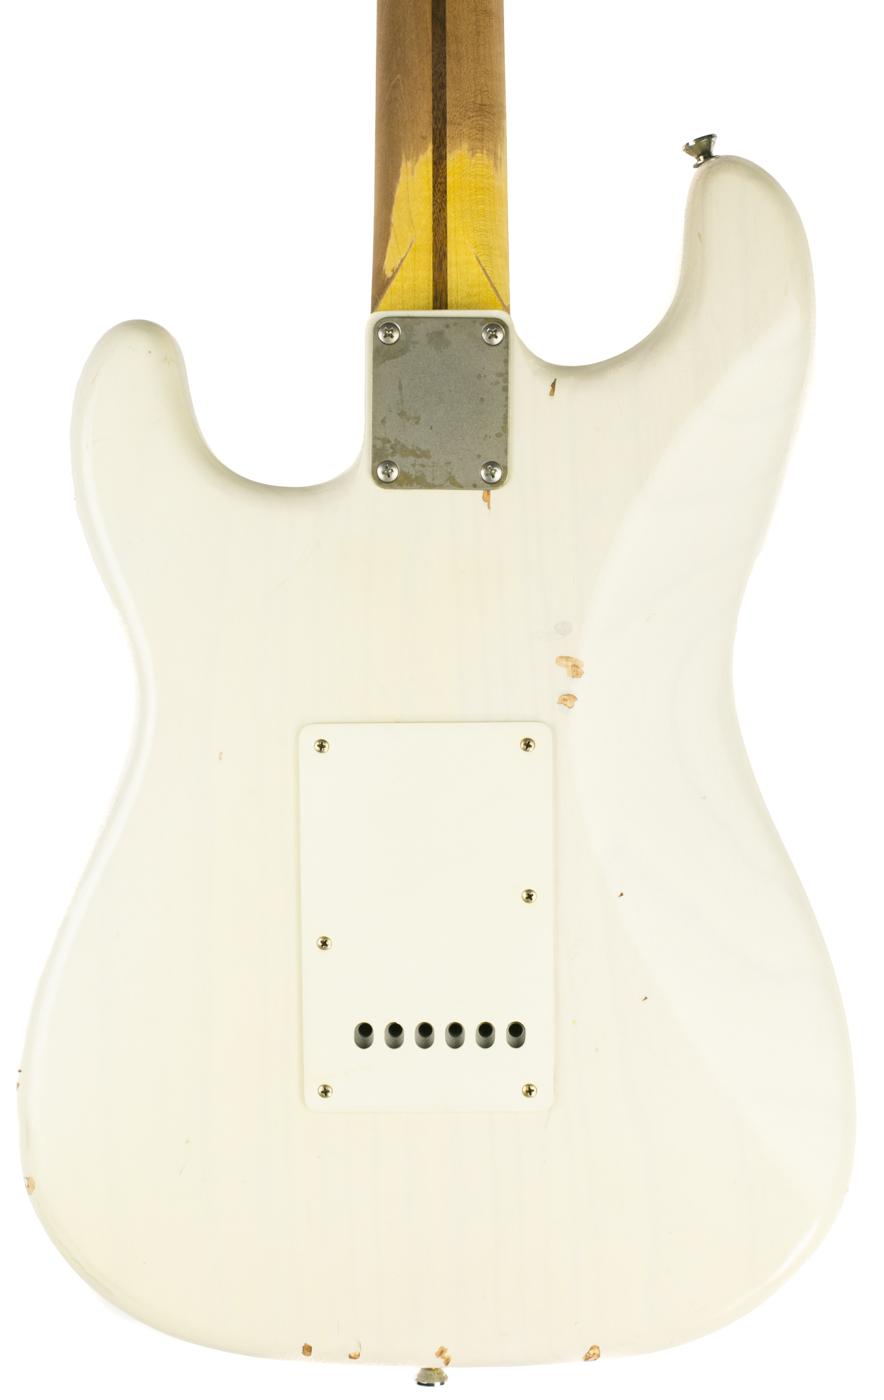 Nash S-57 Blonde detail 2